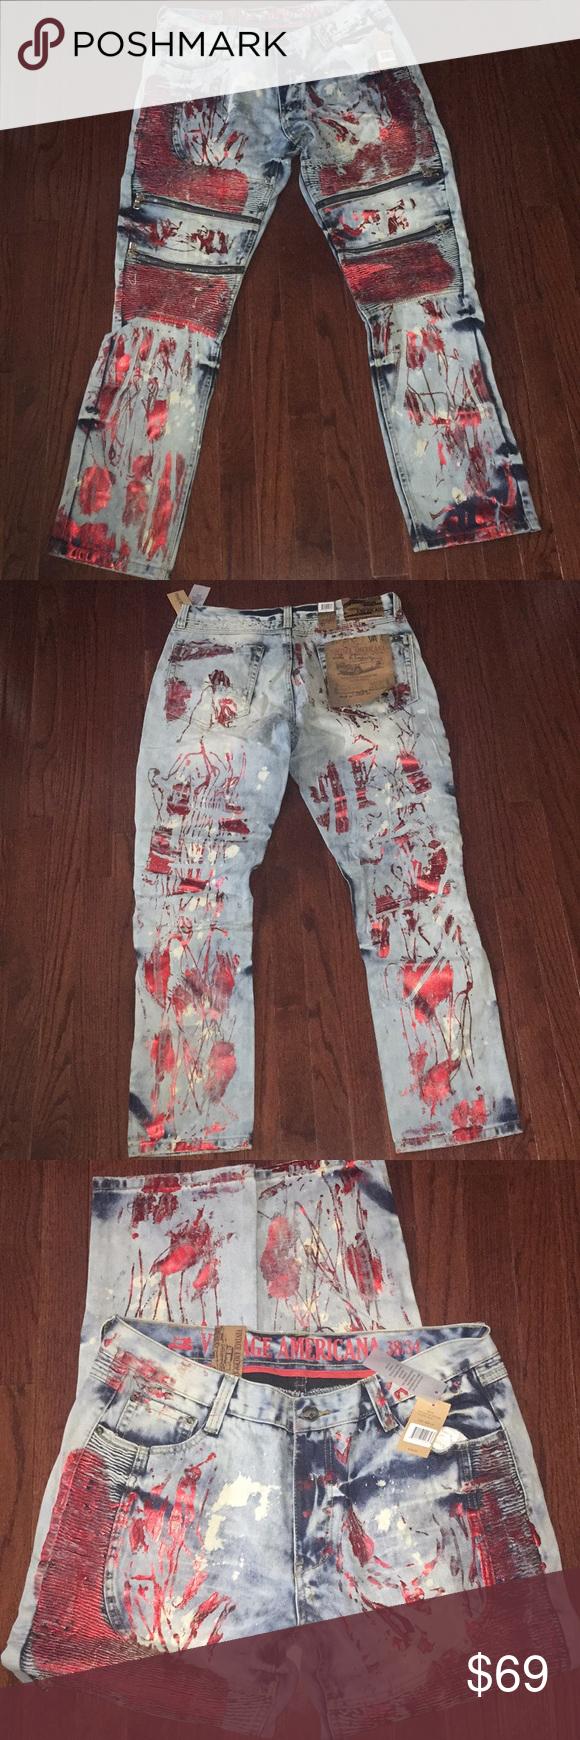 Mens Denim Distressed Painted Jeans Vintage Americana Straight